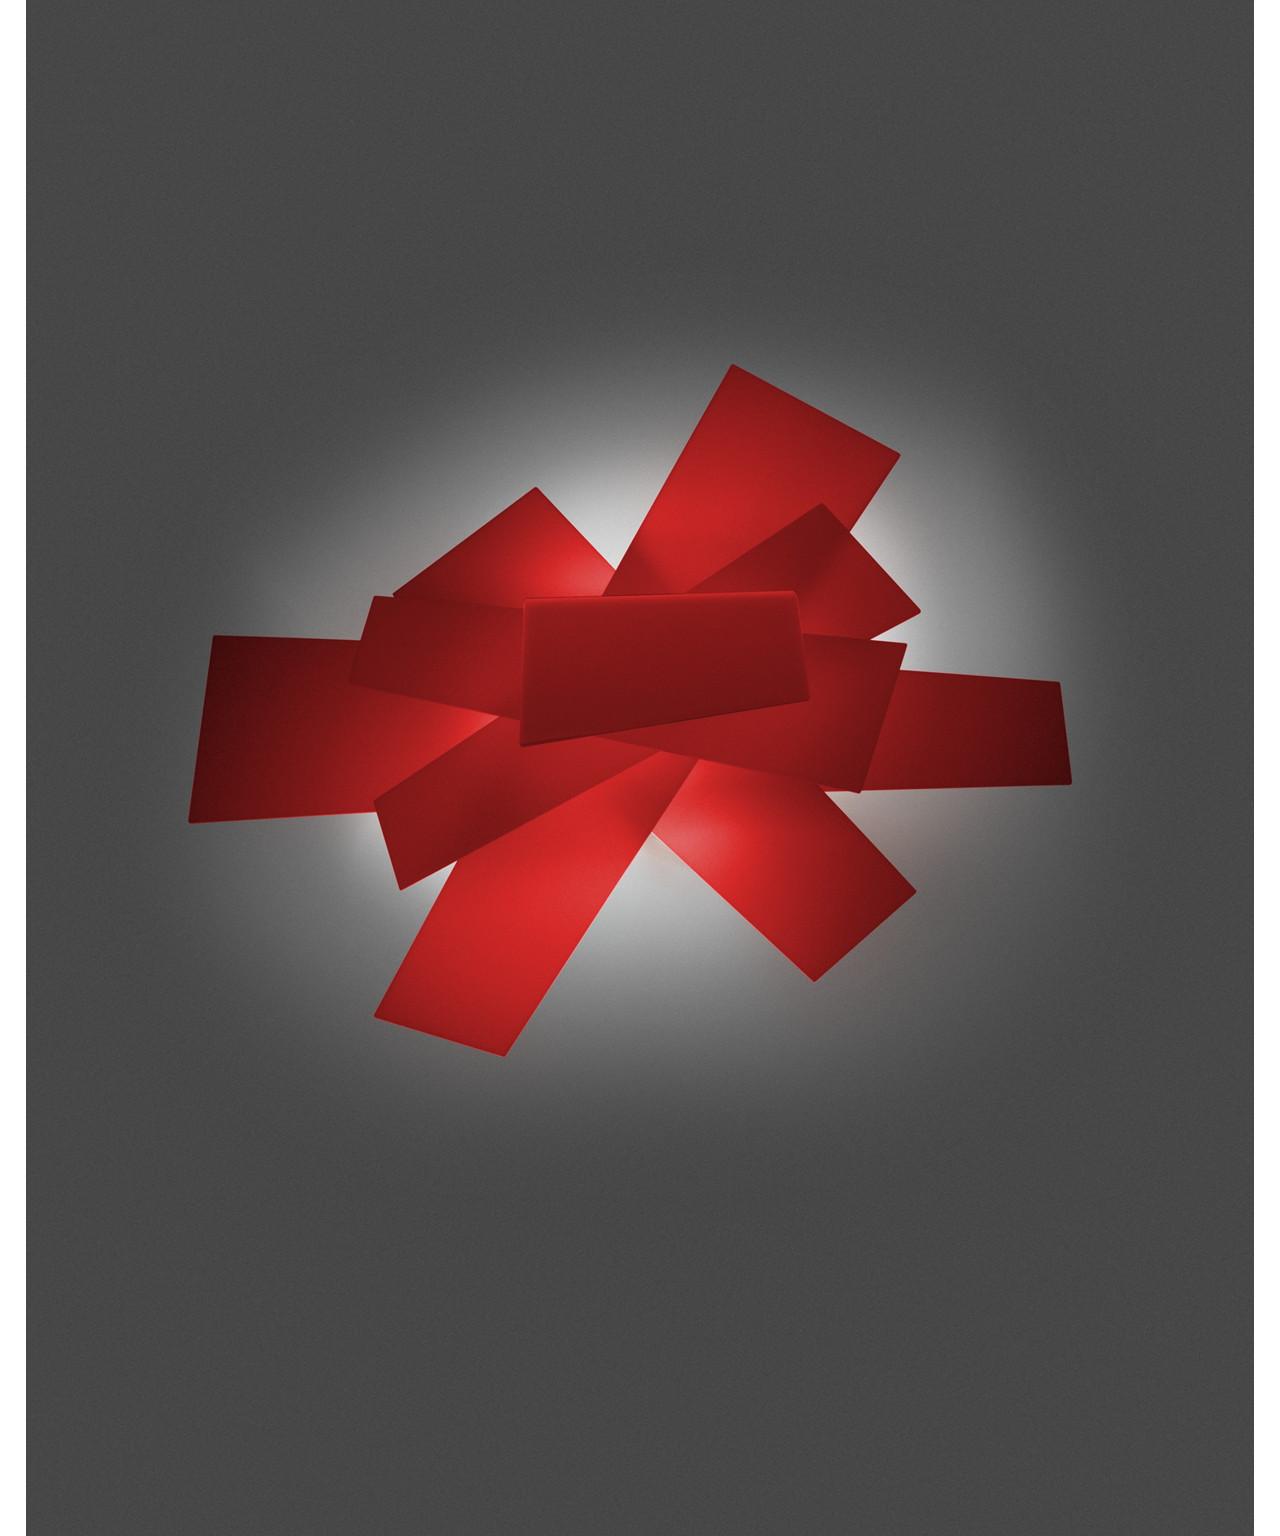 big bang wandleuchte deckenleuchte rot foscarini. Black Bedroom Furniture Sets. Home Design Ideas